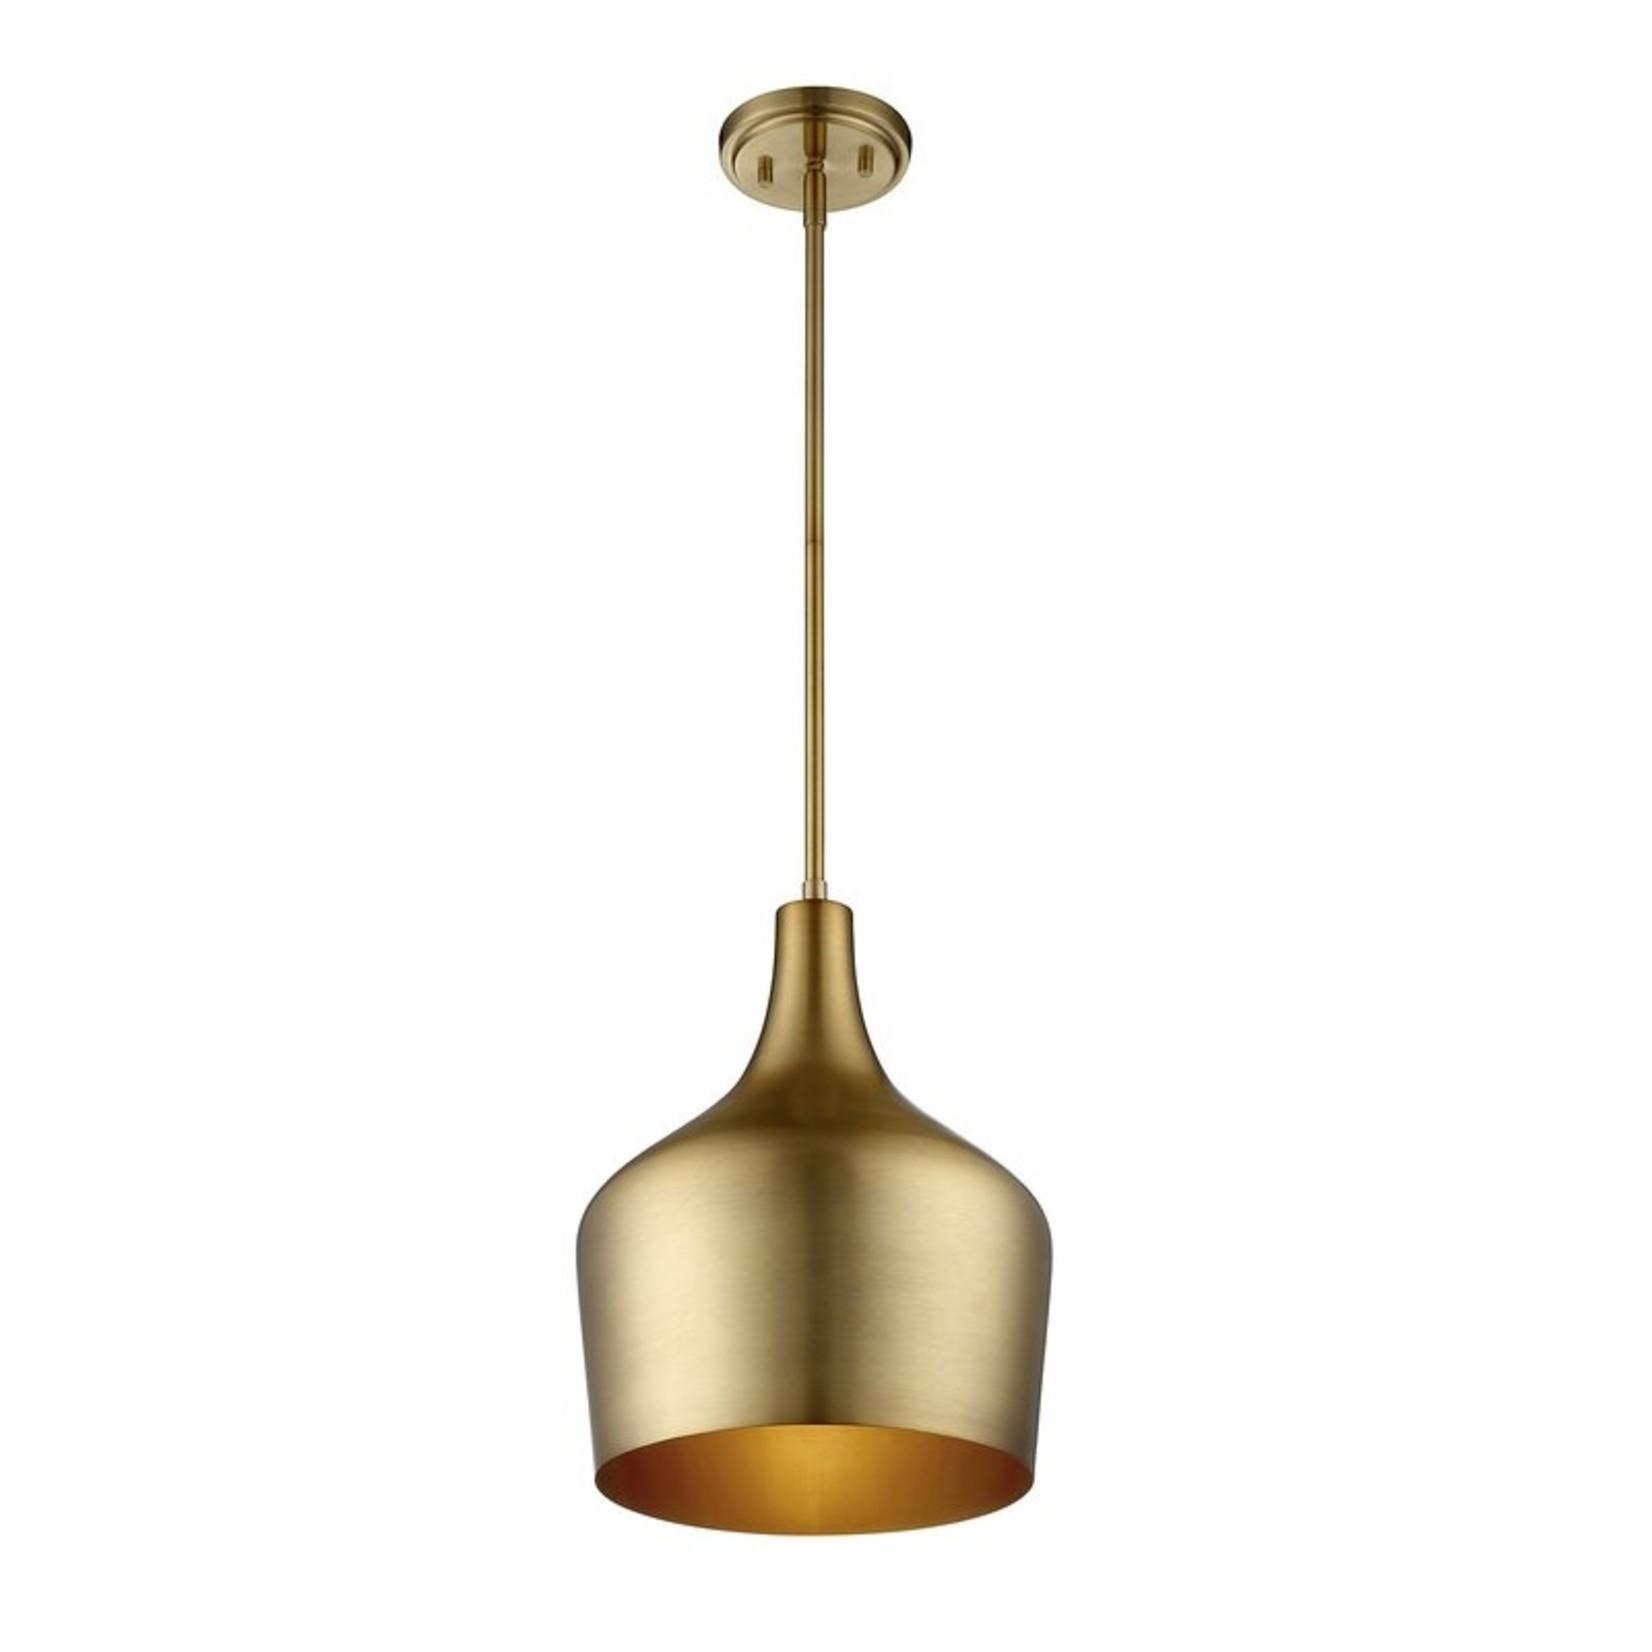 *Knoxville 1-Light Single Bell Pendant - Natural Brass